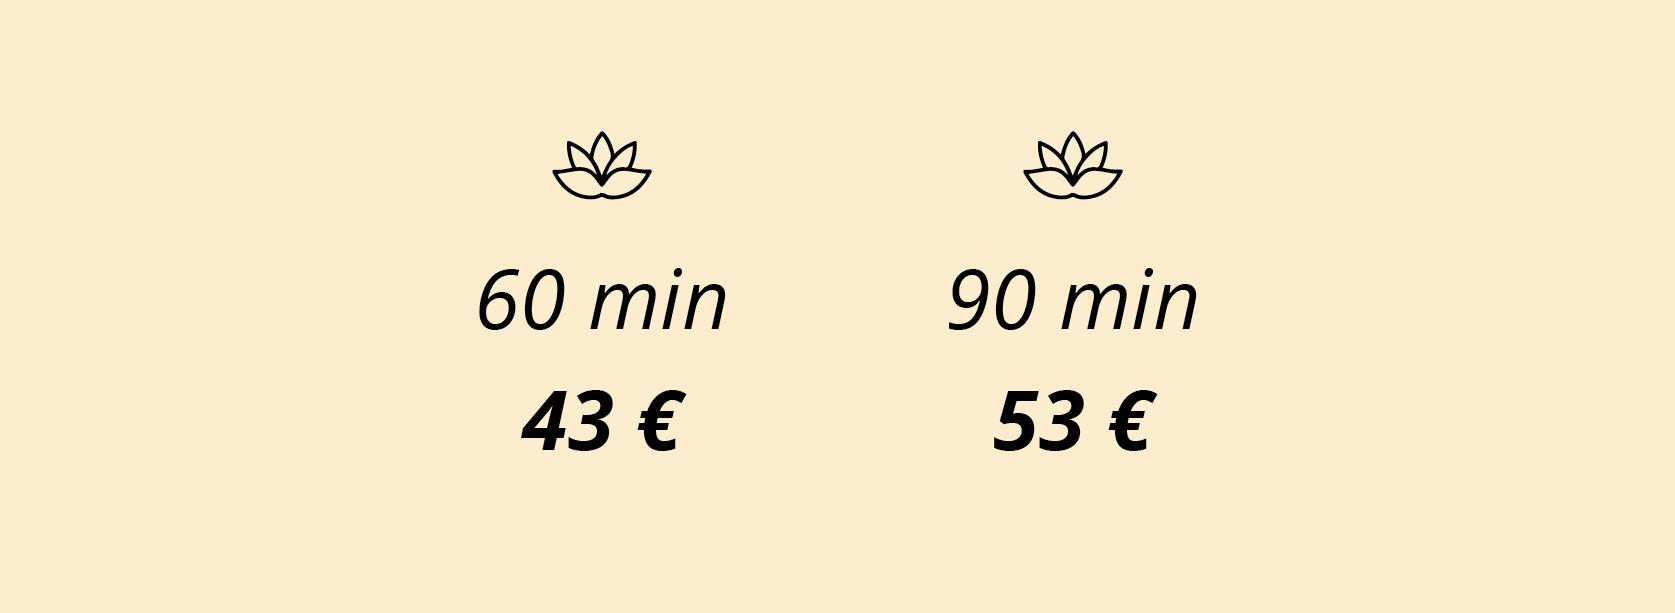 nebo warm herbs price